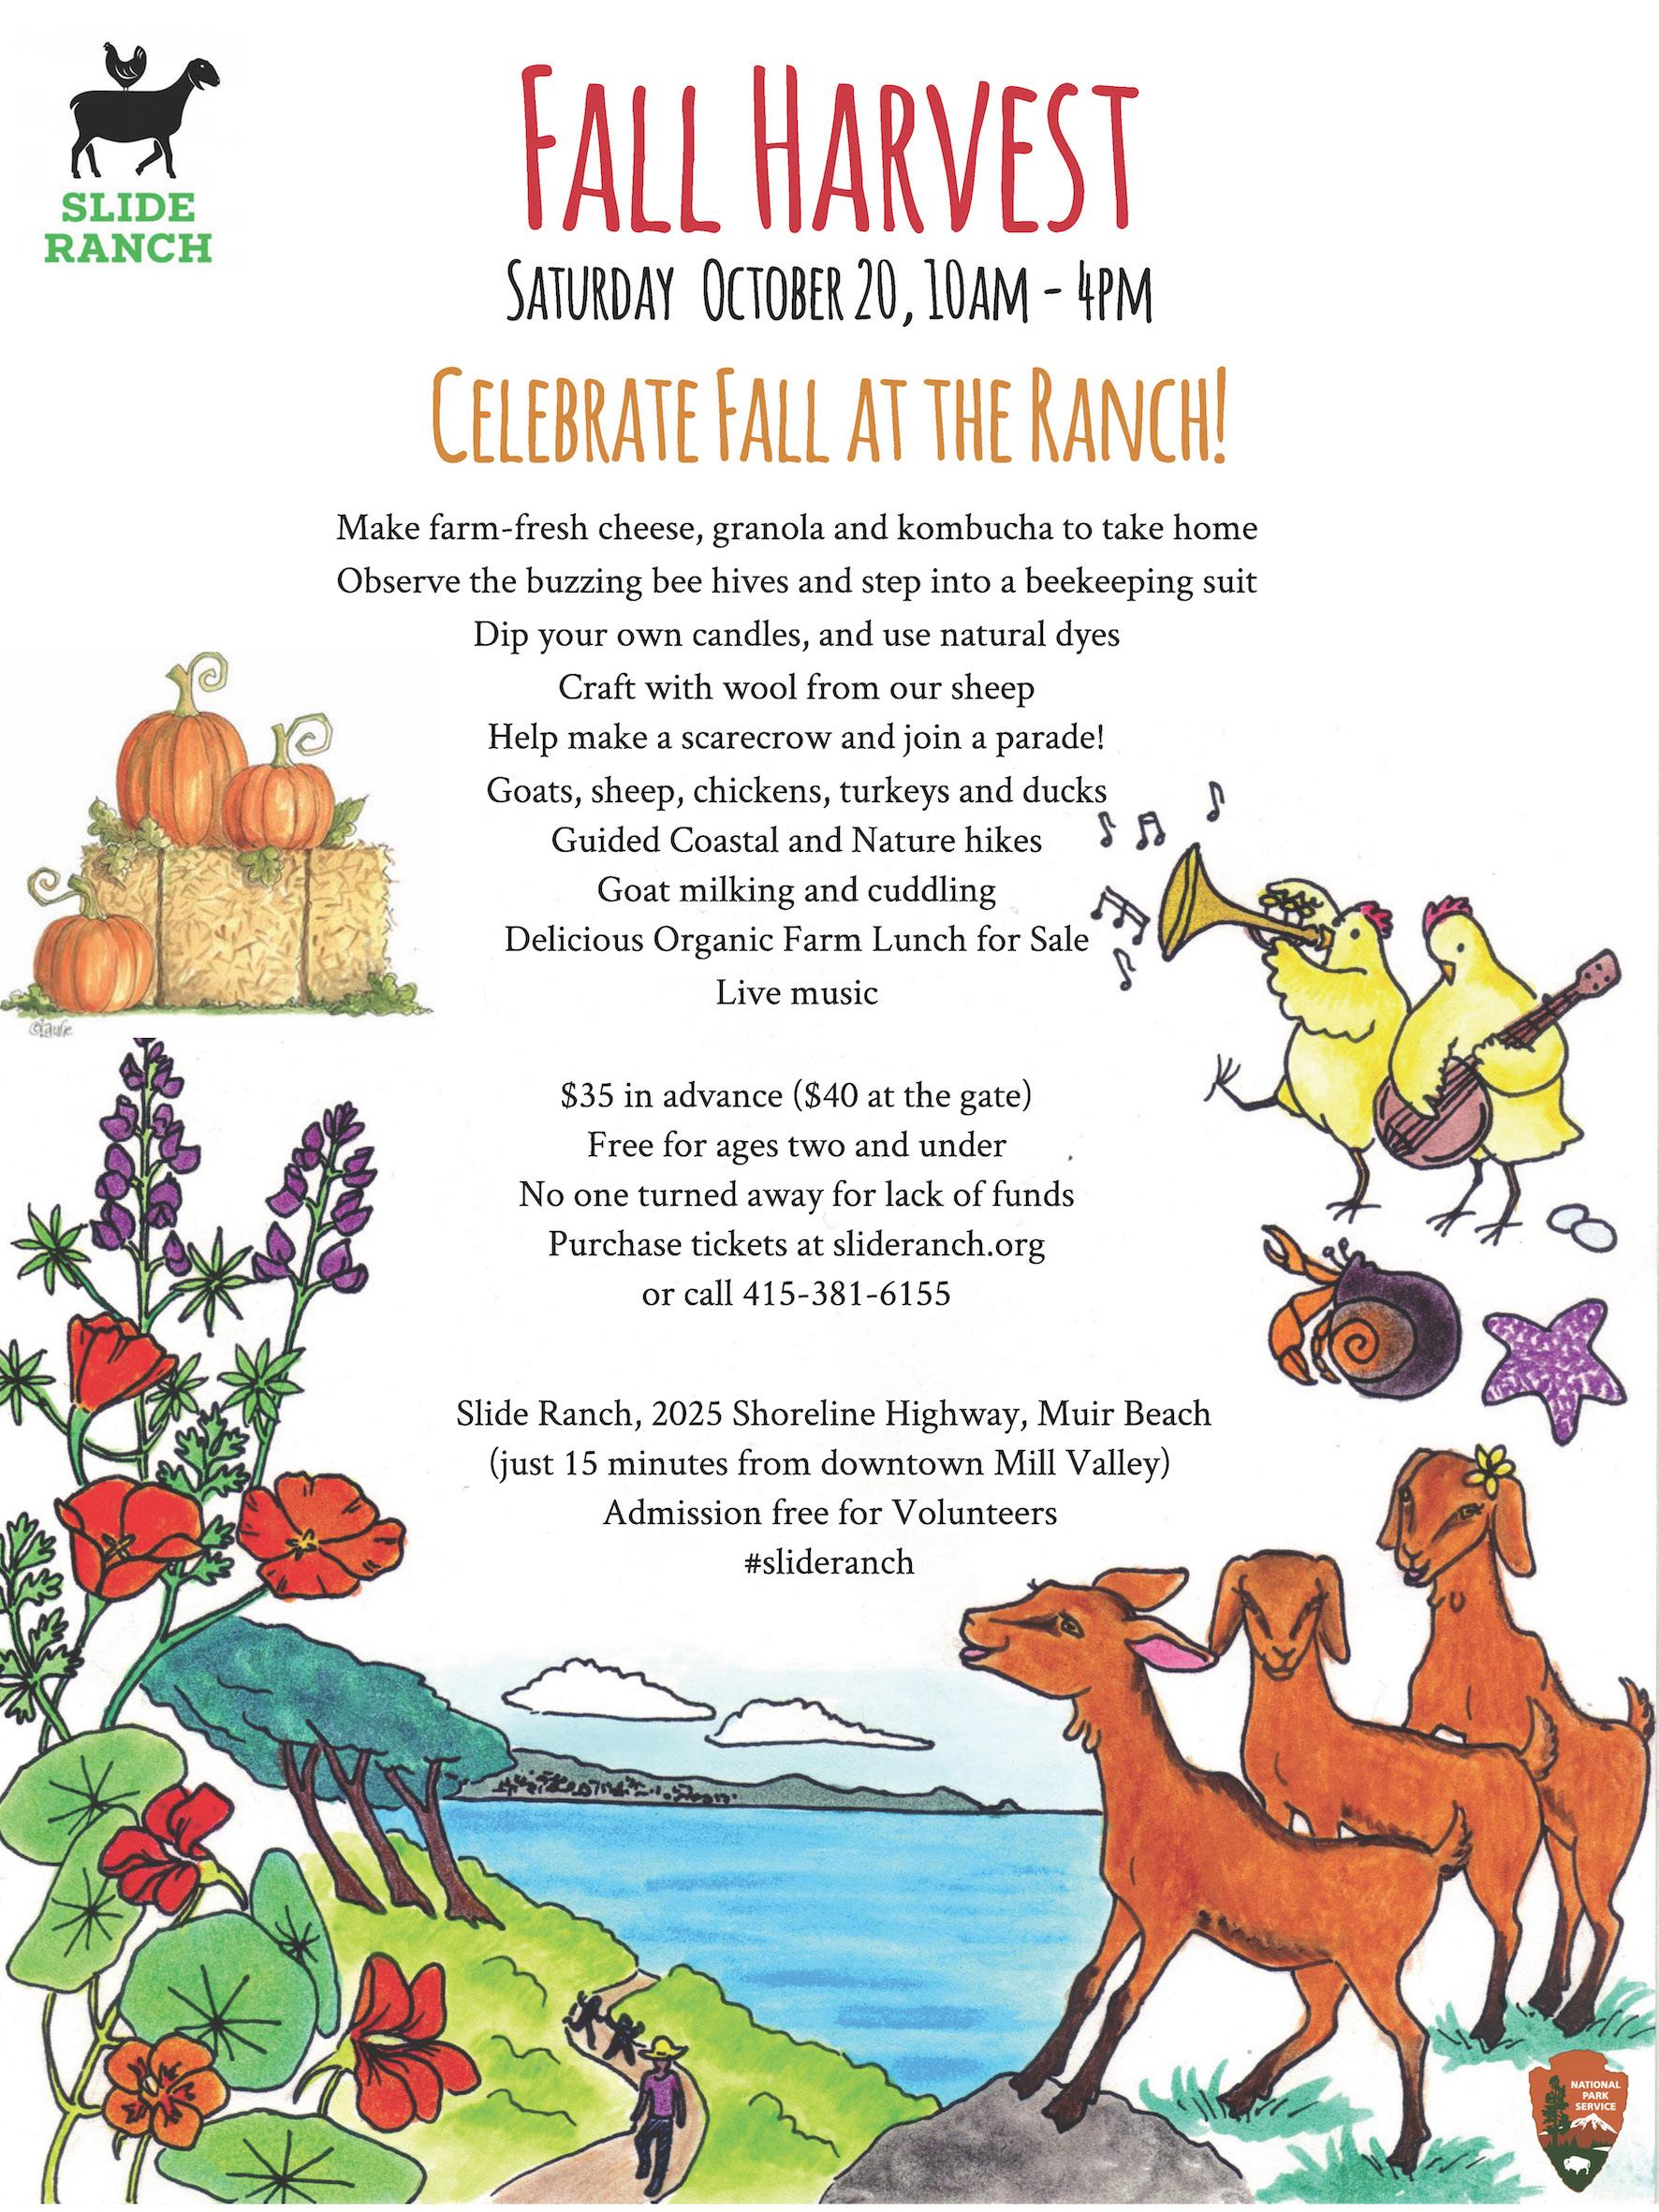 Slide Ranch Fall Harvest flyer